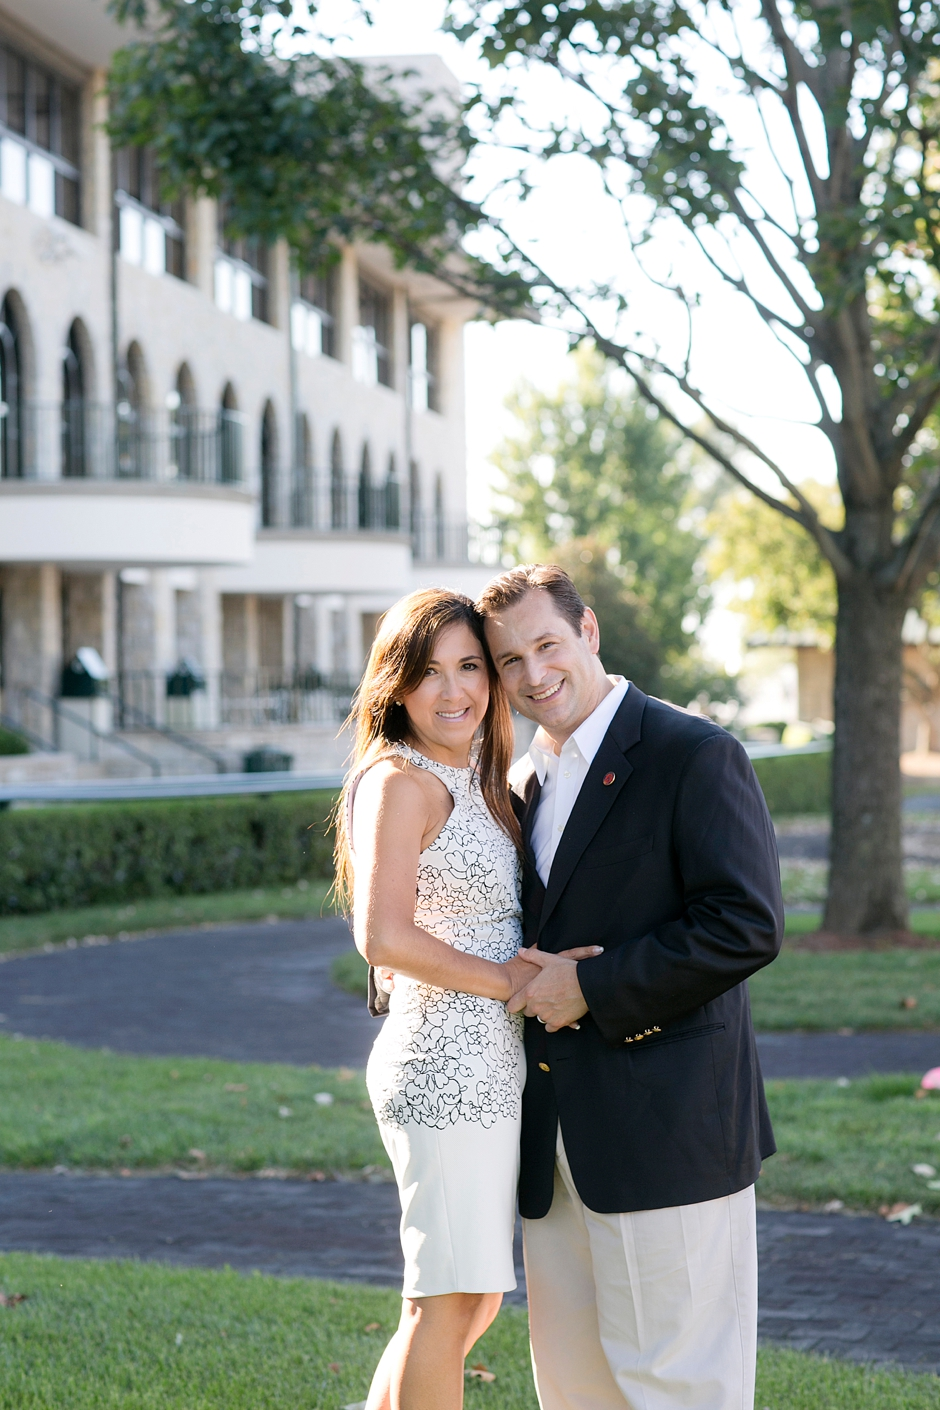 keeneland-family-engagement-photos-dc-couple-04